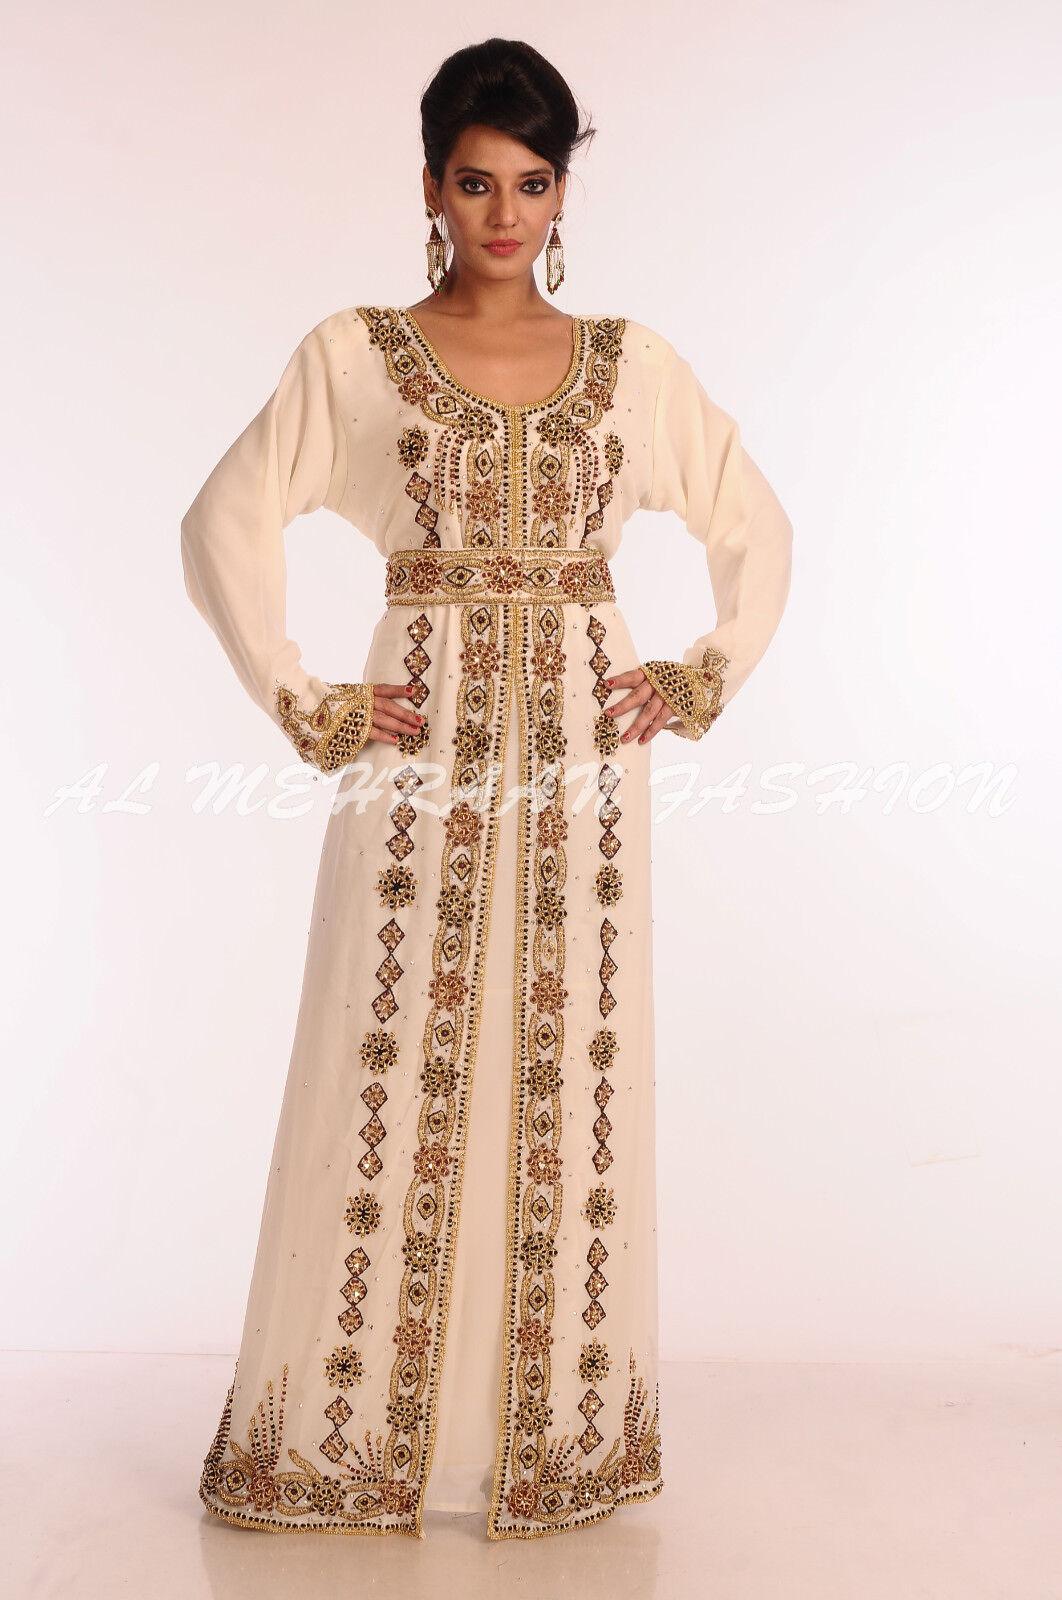 DUBAI MODERN BRIDAL CAFTAN DRESS MgoldCCAN ARABIC ISLAMIC WEAR AT RAMADAN SALE